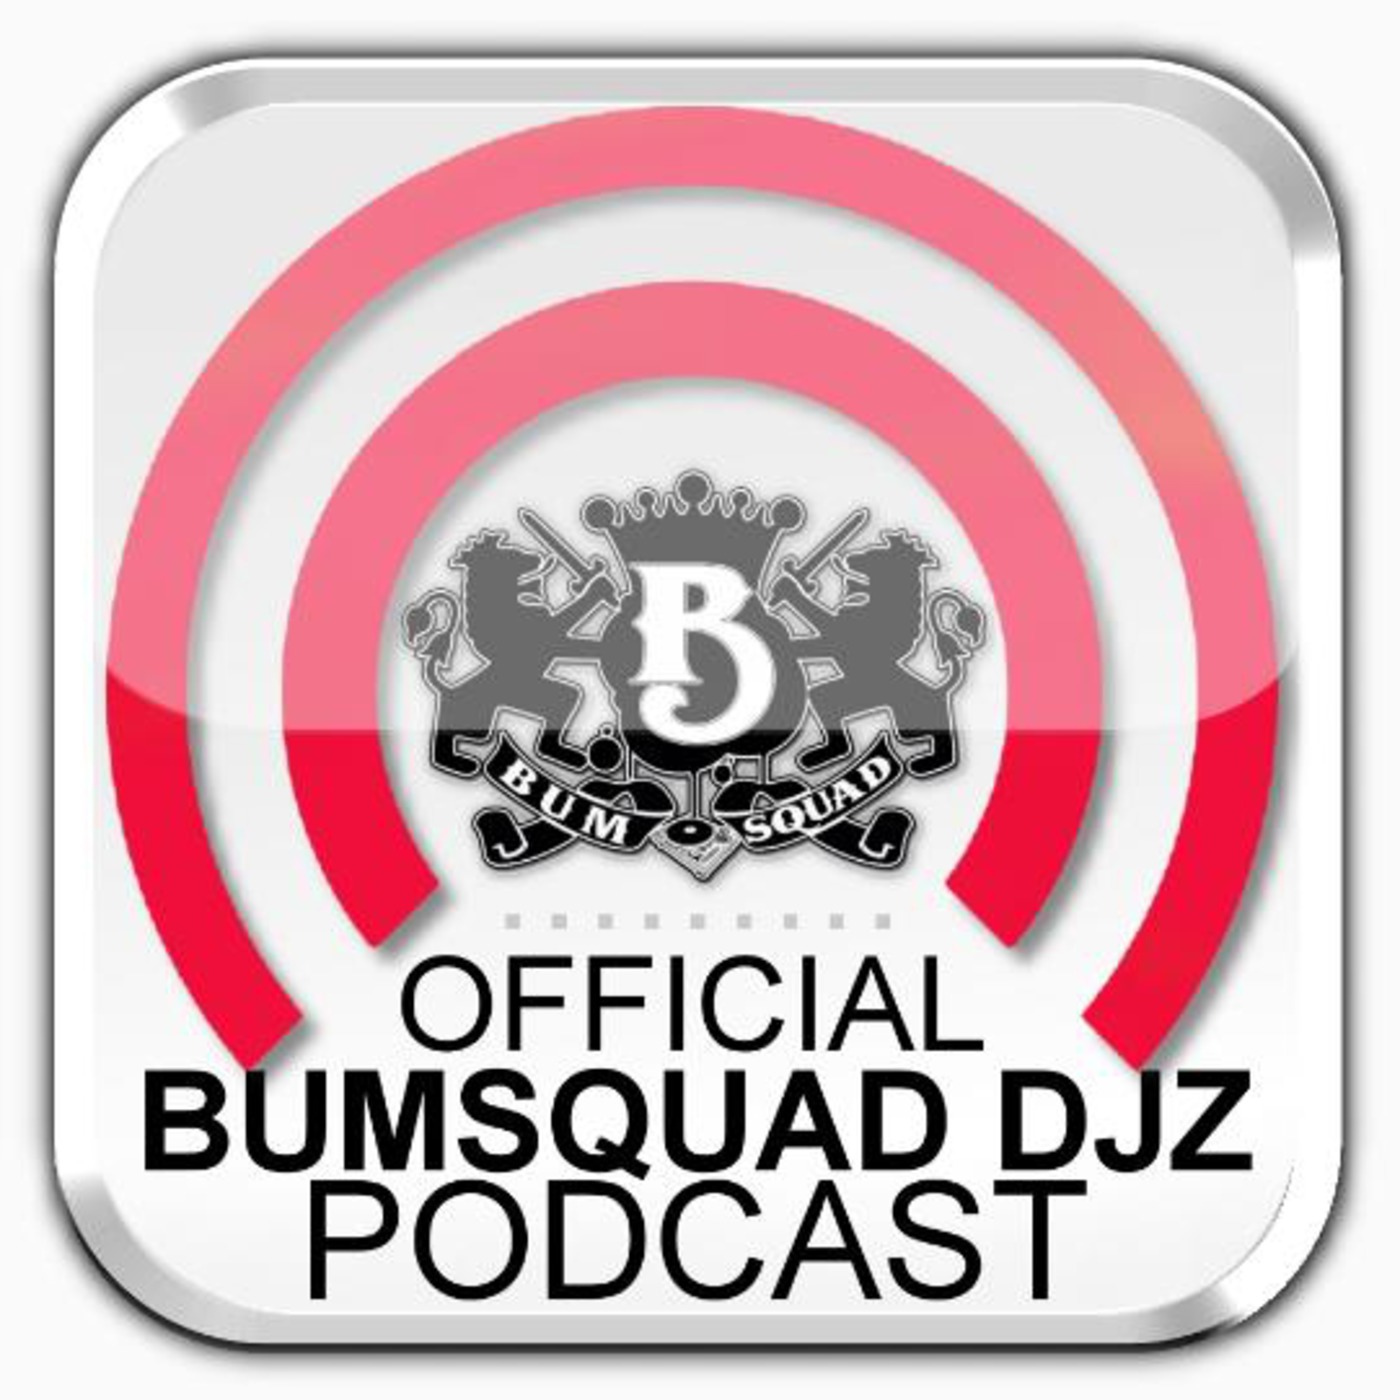 Bum Squad DJz Podcast